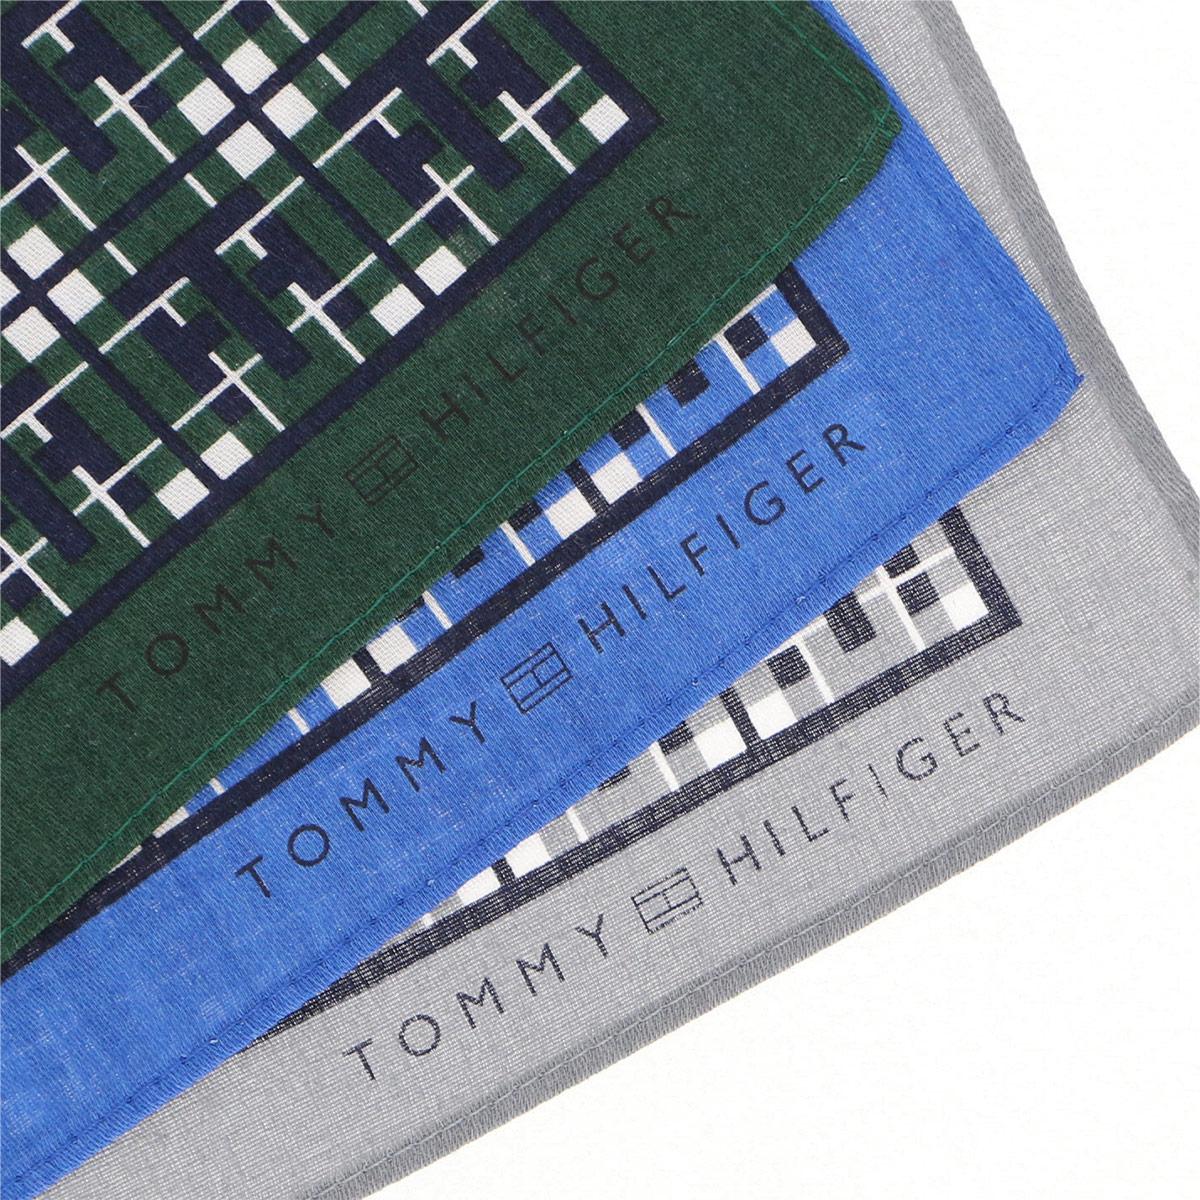 TOMMY HILFIGER|トミーヒルフィガー  ブランド ラッピングOK チェック柄 綿100% ハンカチ 男性 紳士 メンズ プレゼント 贈答 ギフト 入学祝 就職祝 2582-149【ゆうパケット・4点まで】